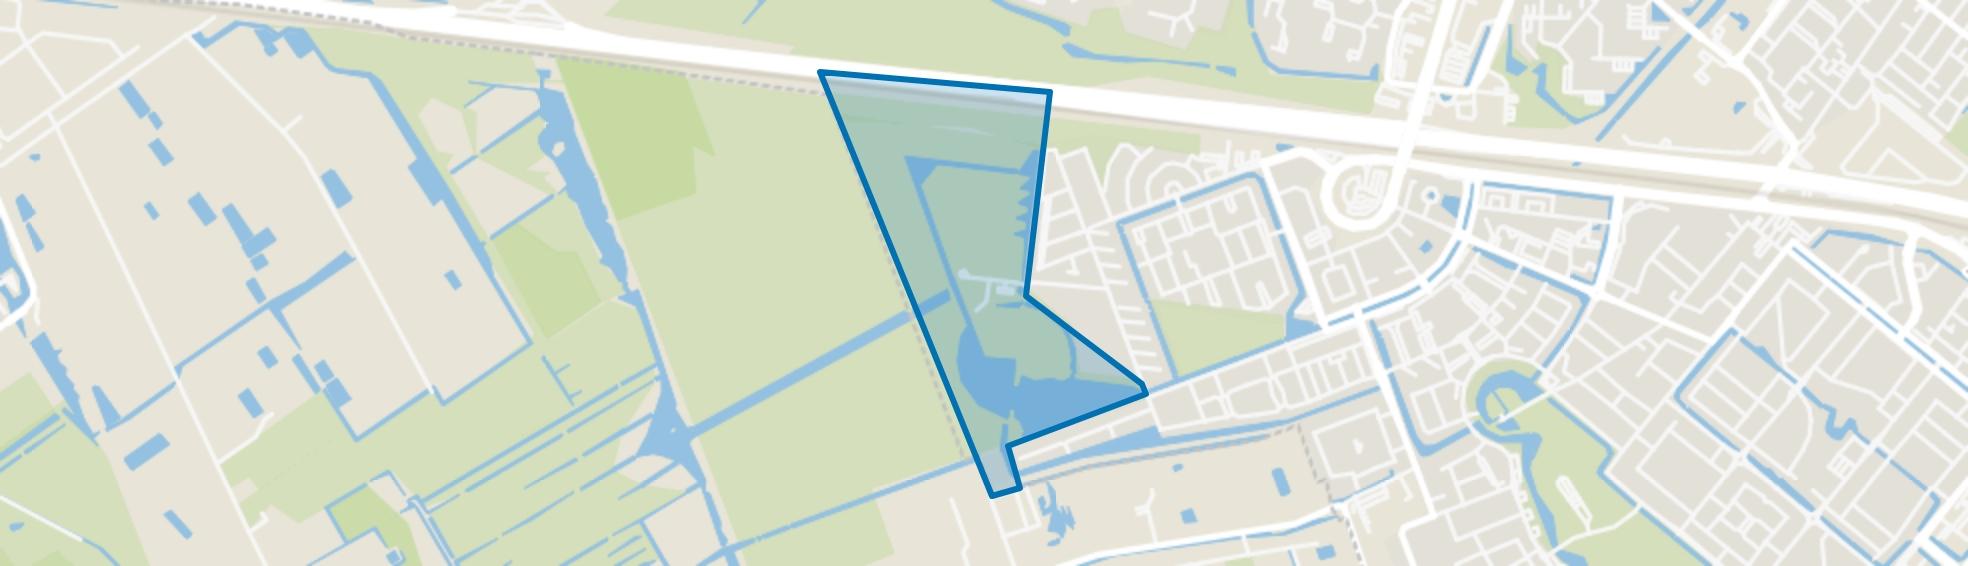 Balijbos, Zoetermeer map